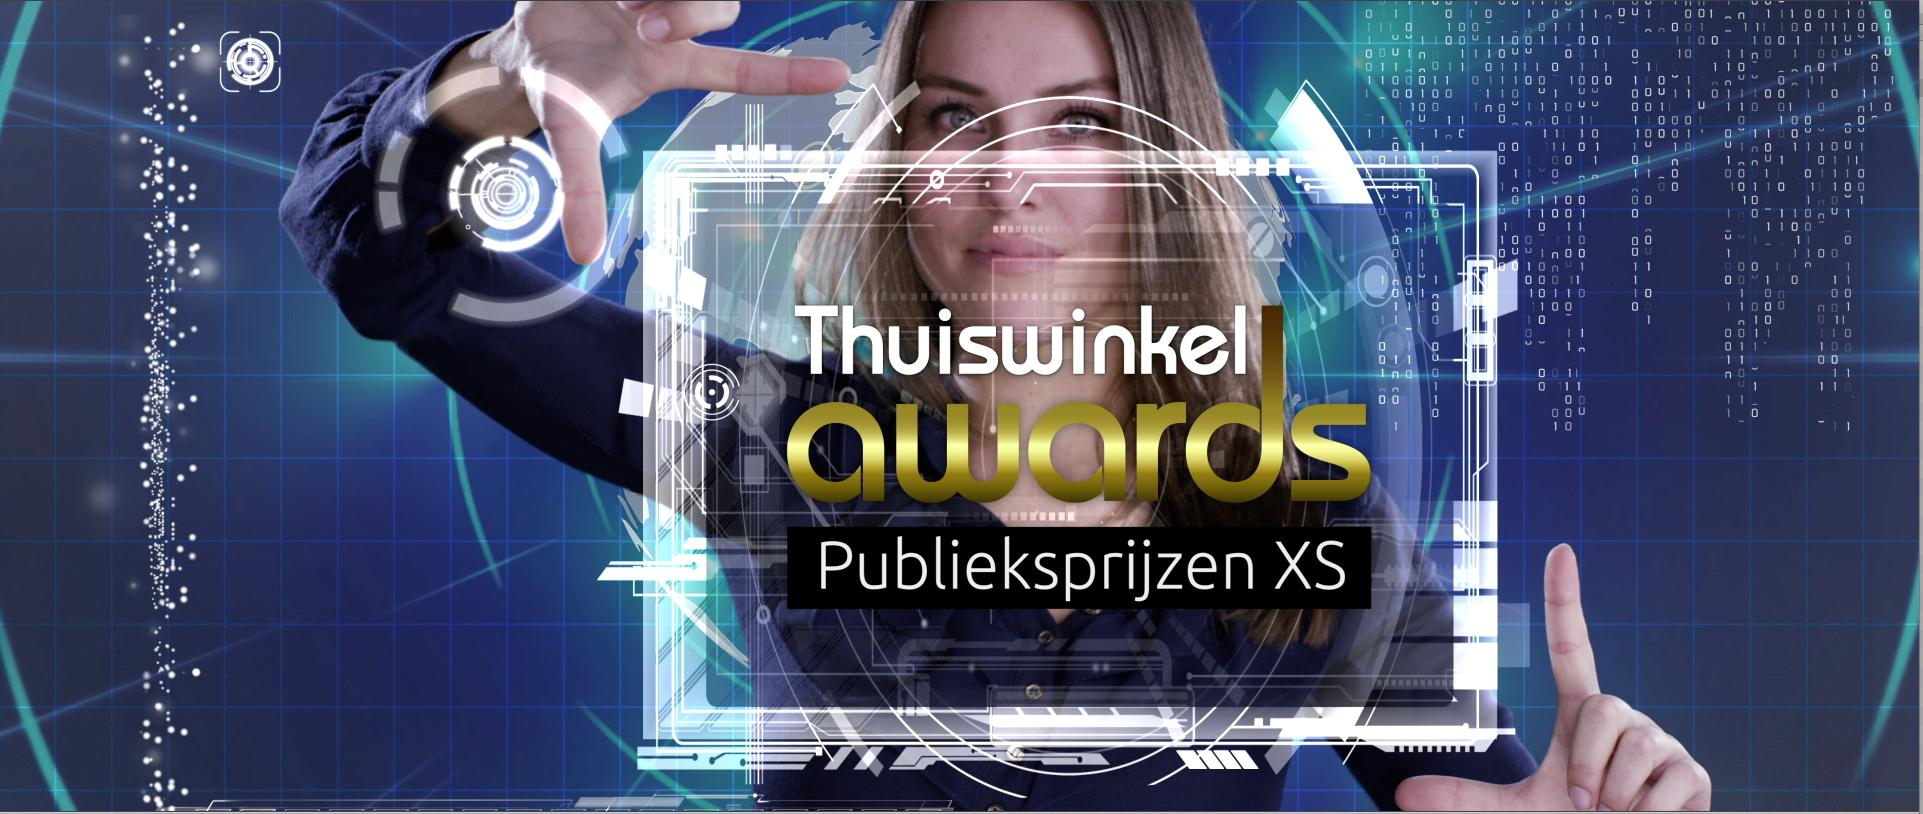 Thuiswinkel Awards XS